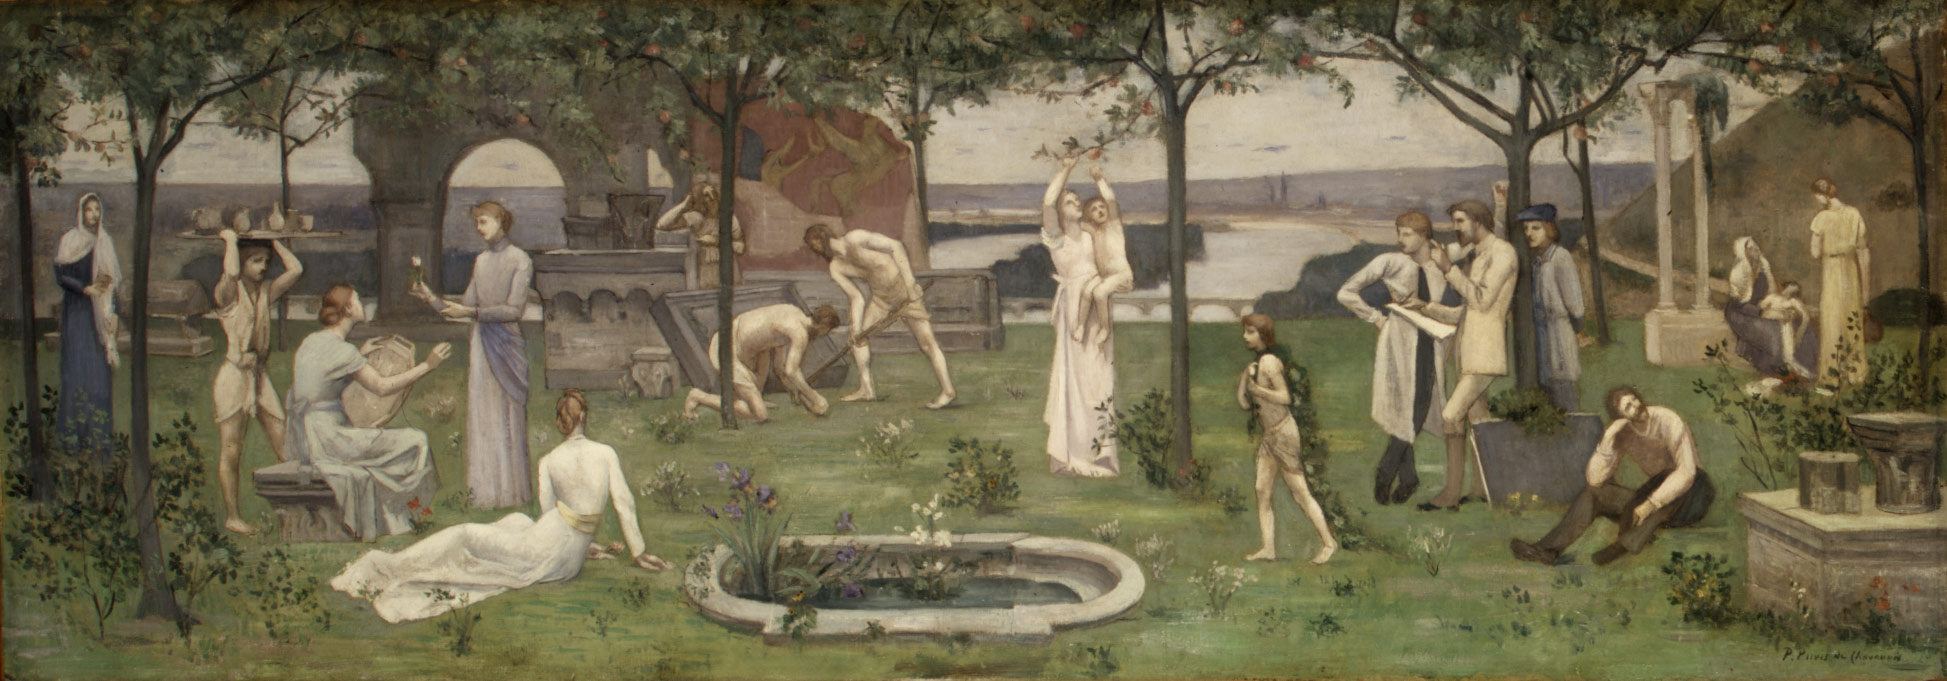 Symbolism Essay Heilbrunn Timeline Of Art History